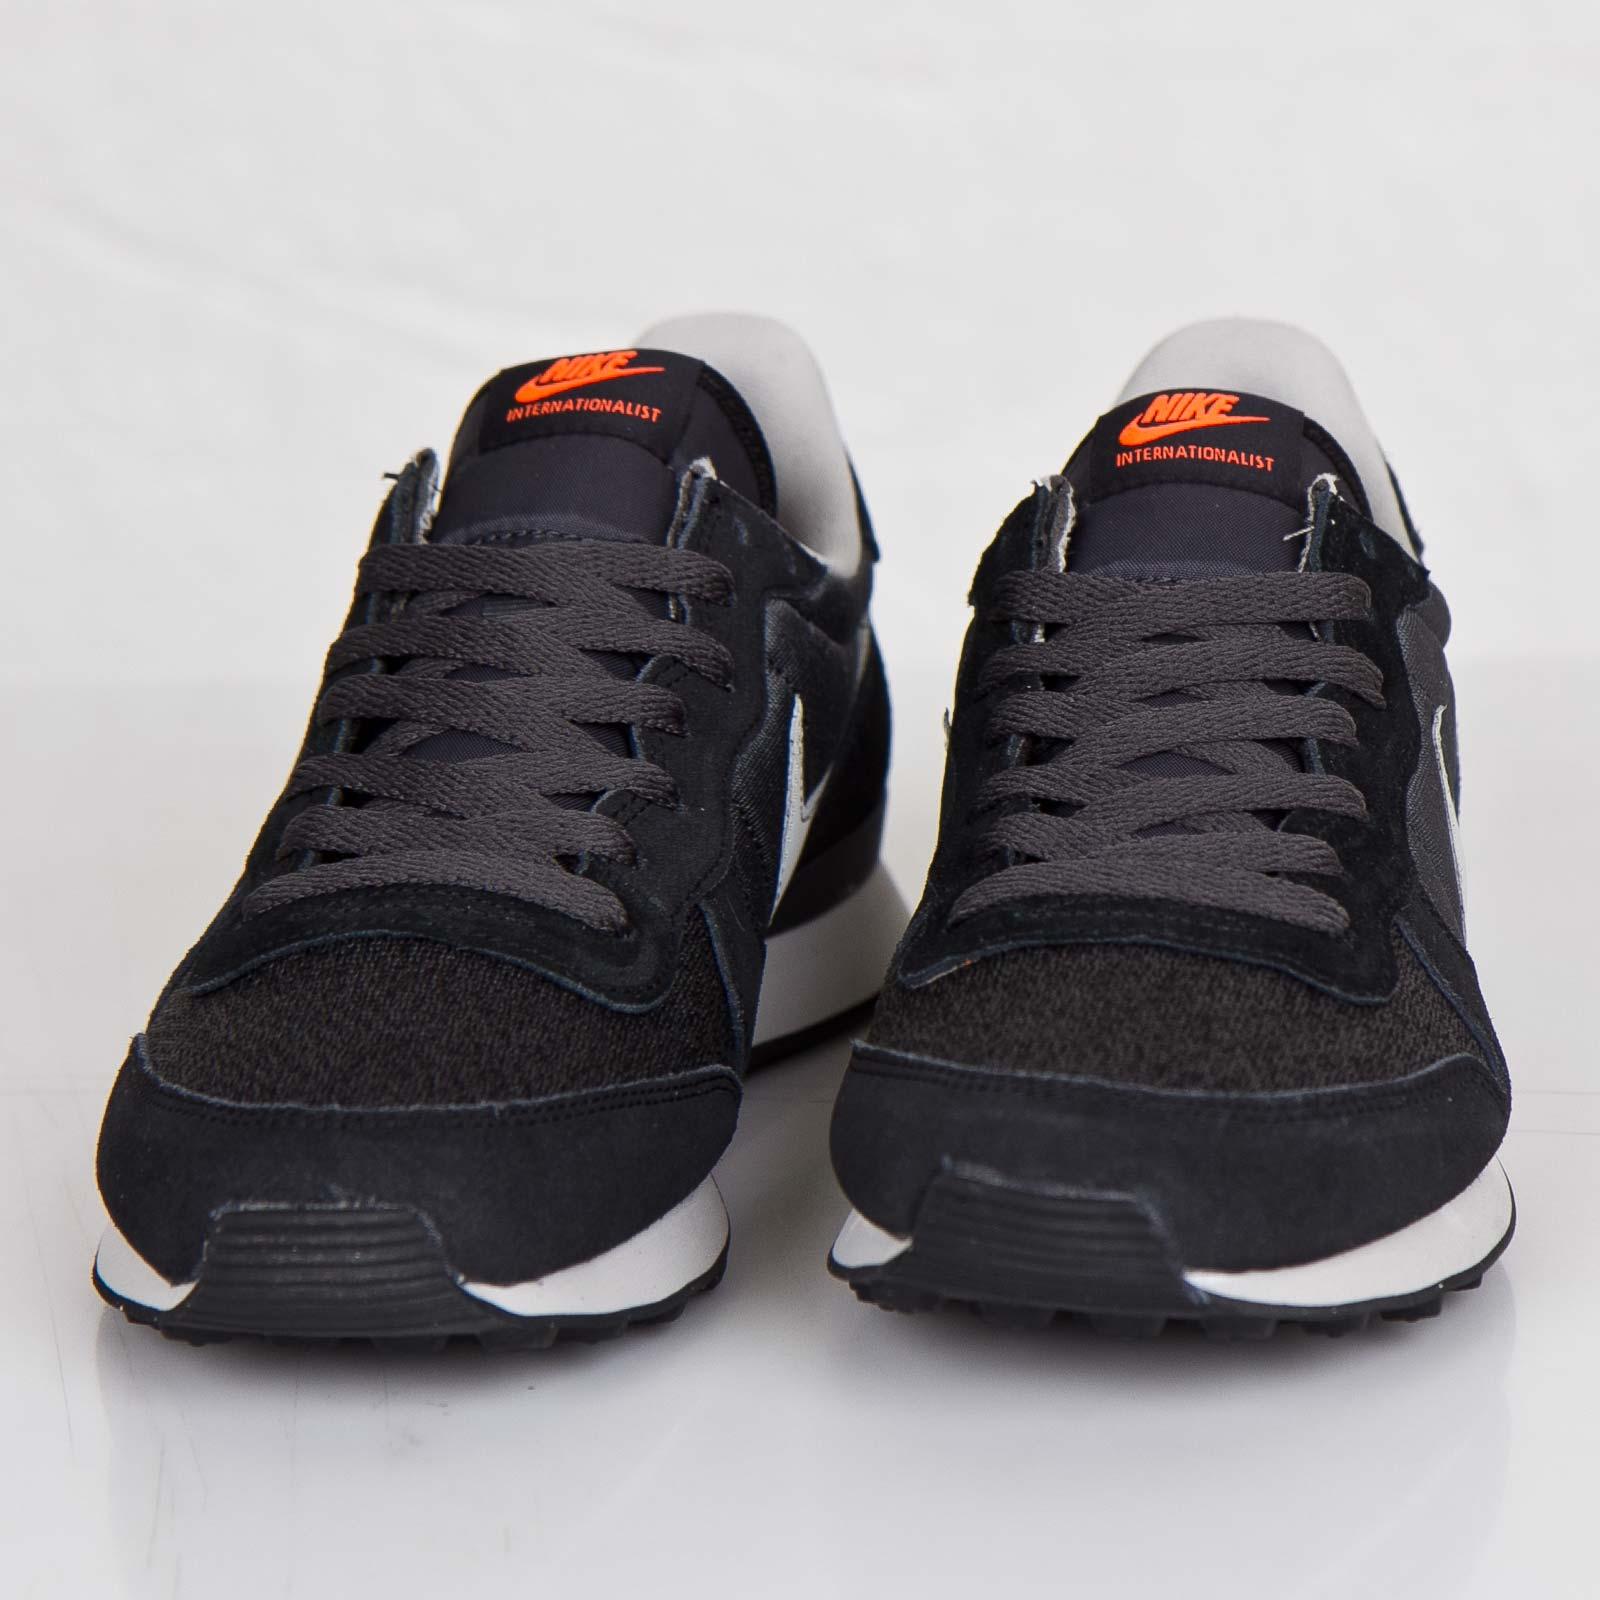 Nike Internationalist - 631754-004 - SNS | sneakers & streetwear ...